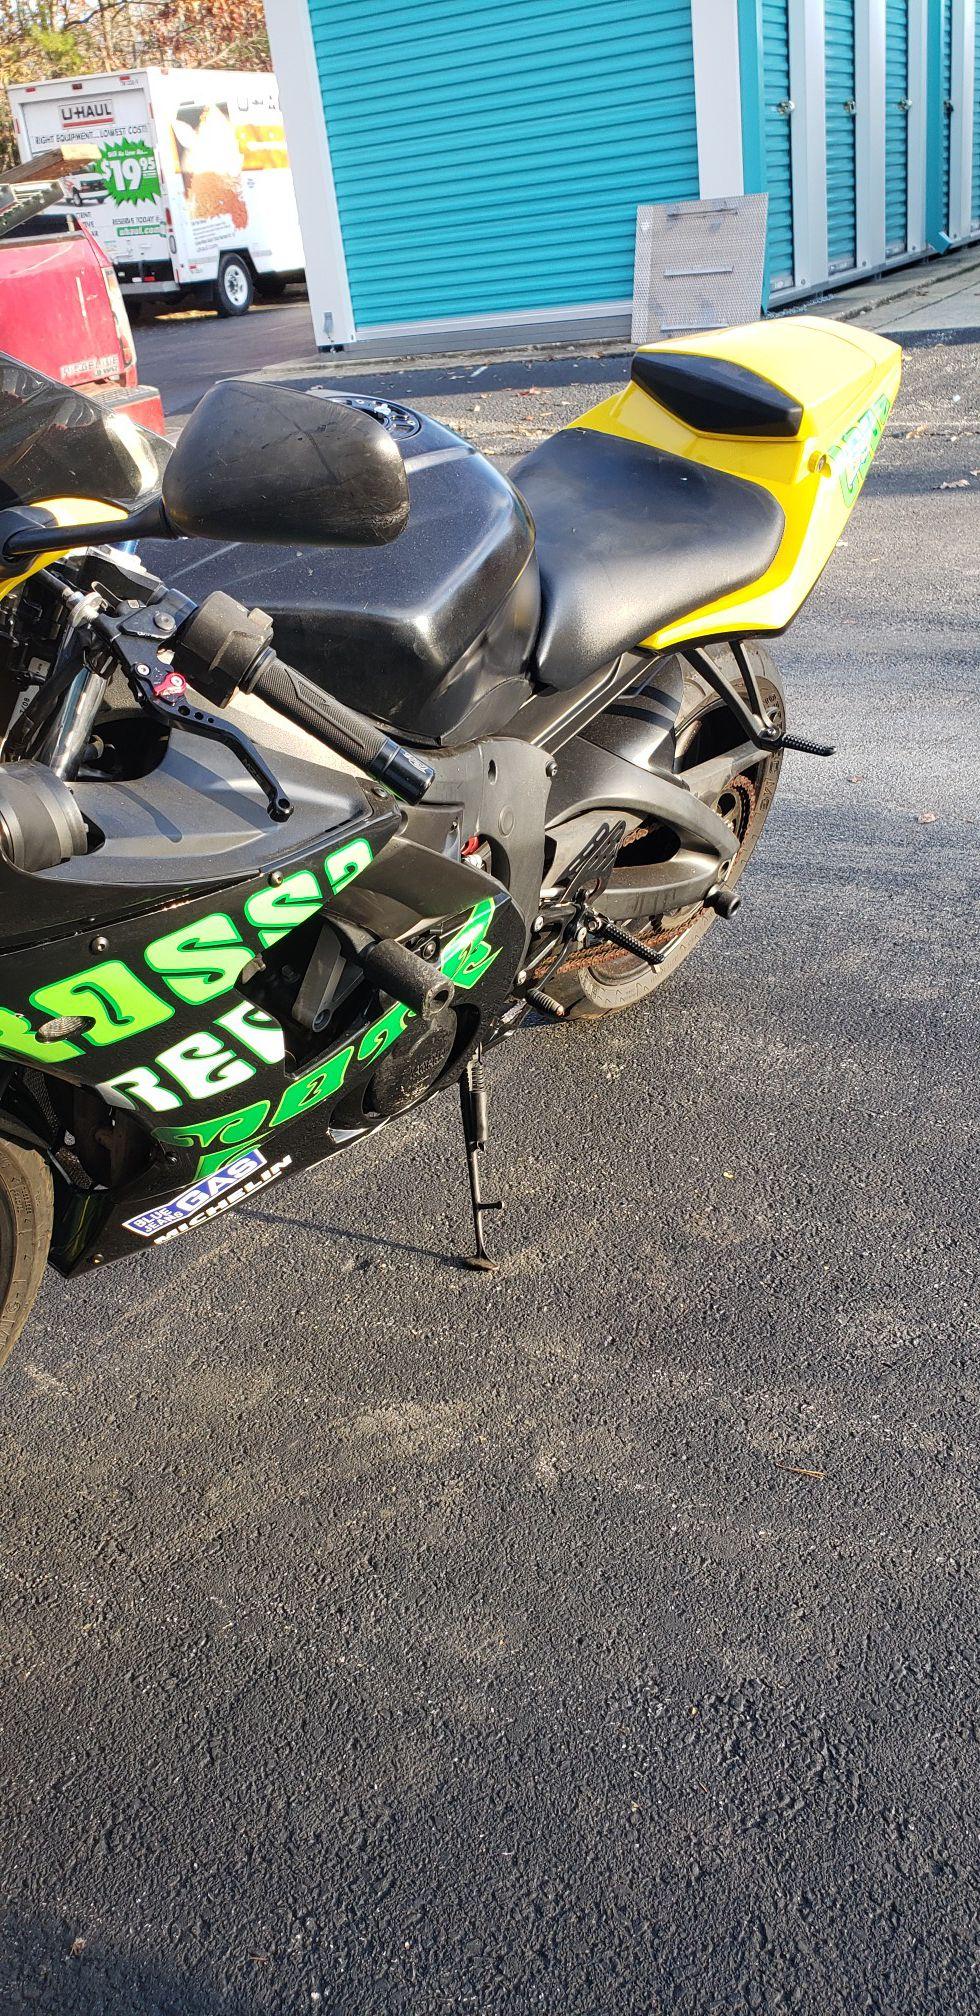 06 Yamaha R6 Motorcycle